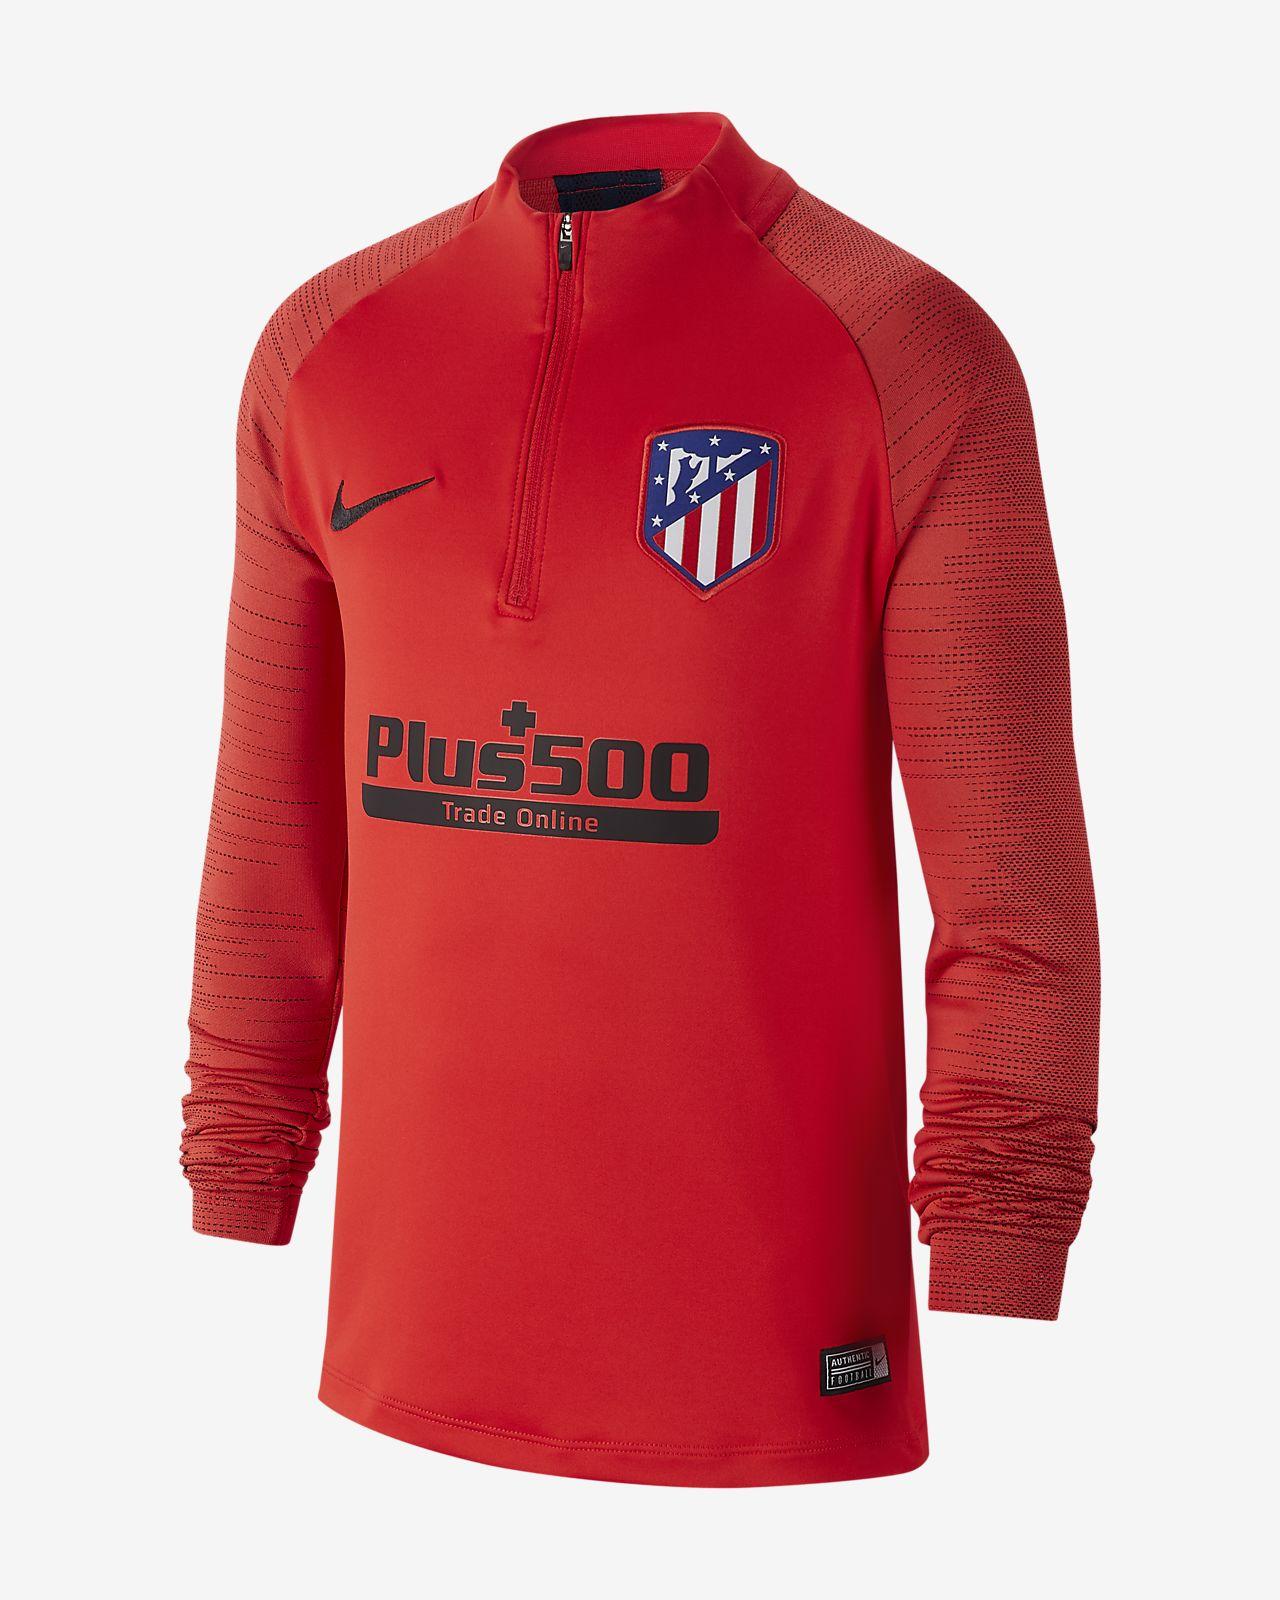 Nike Dri-FIT Atlético de Madrid Strike Genç Çocuk Futbol Antrenman Üstü